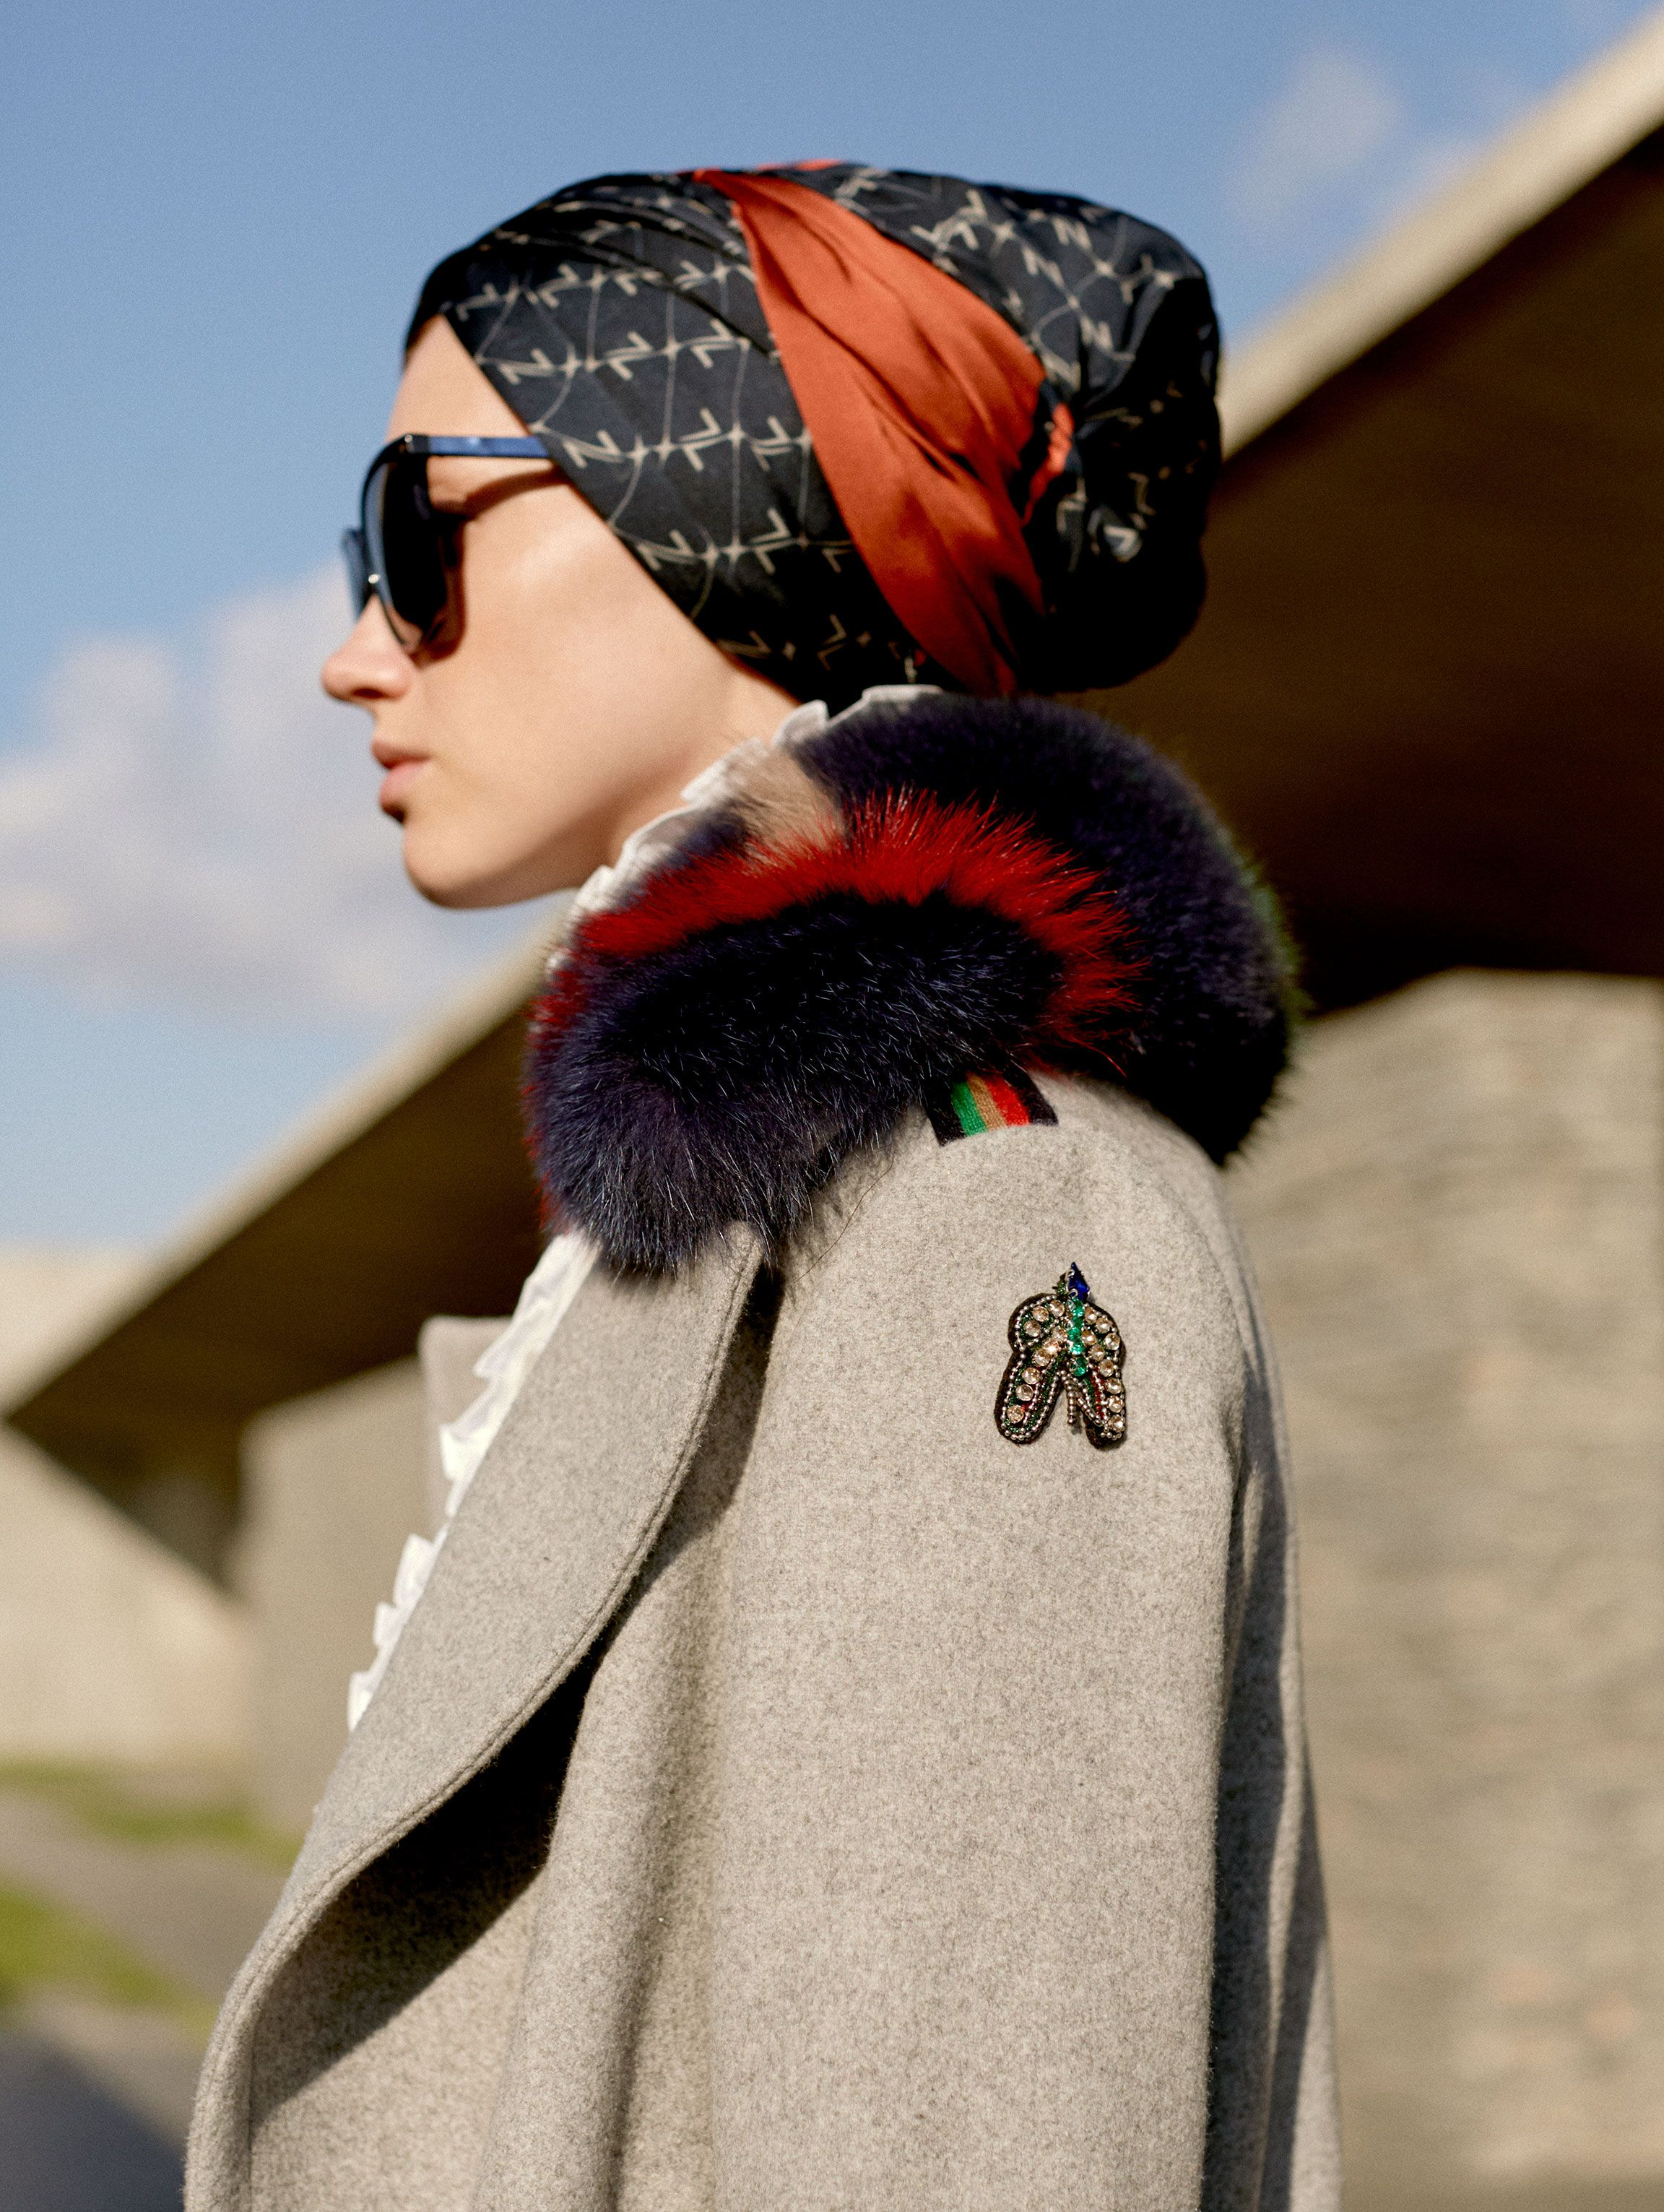 Modest New Fashion Fall Winter #ZUHRE | Giyim, Sonbahar ...